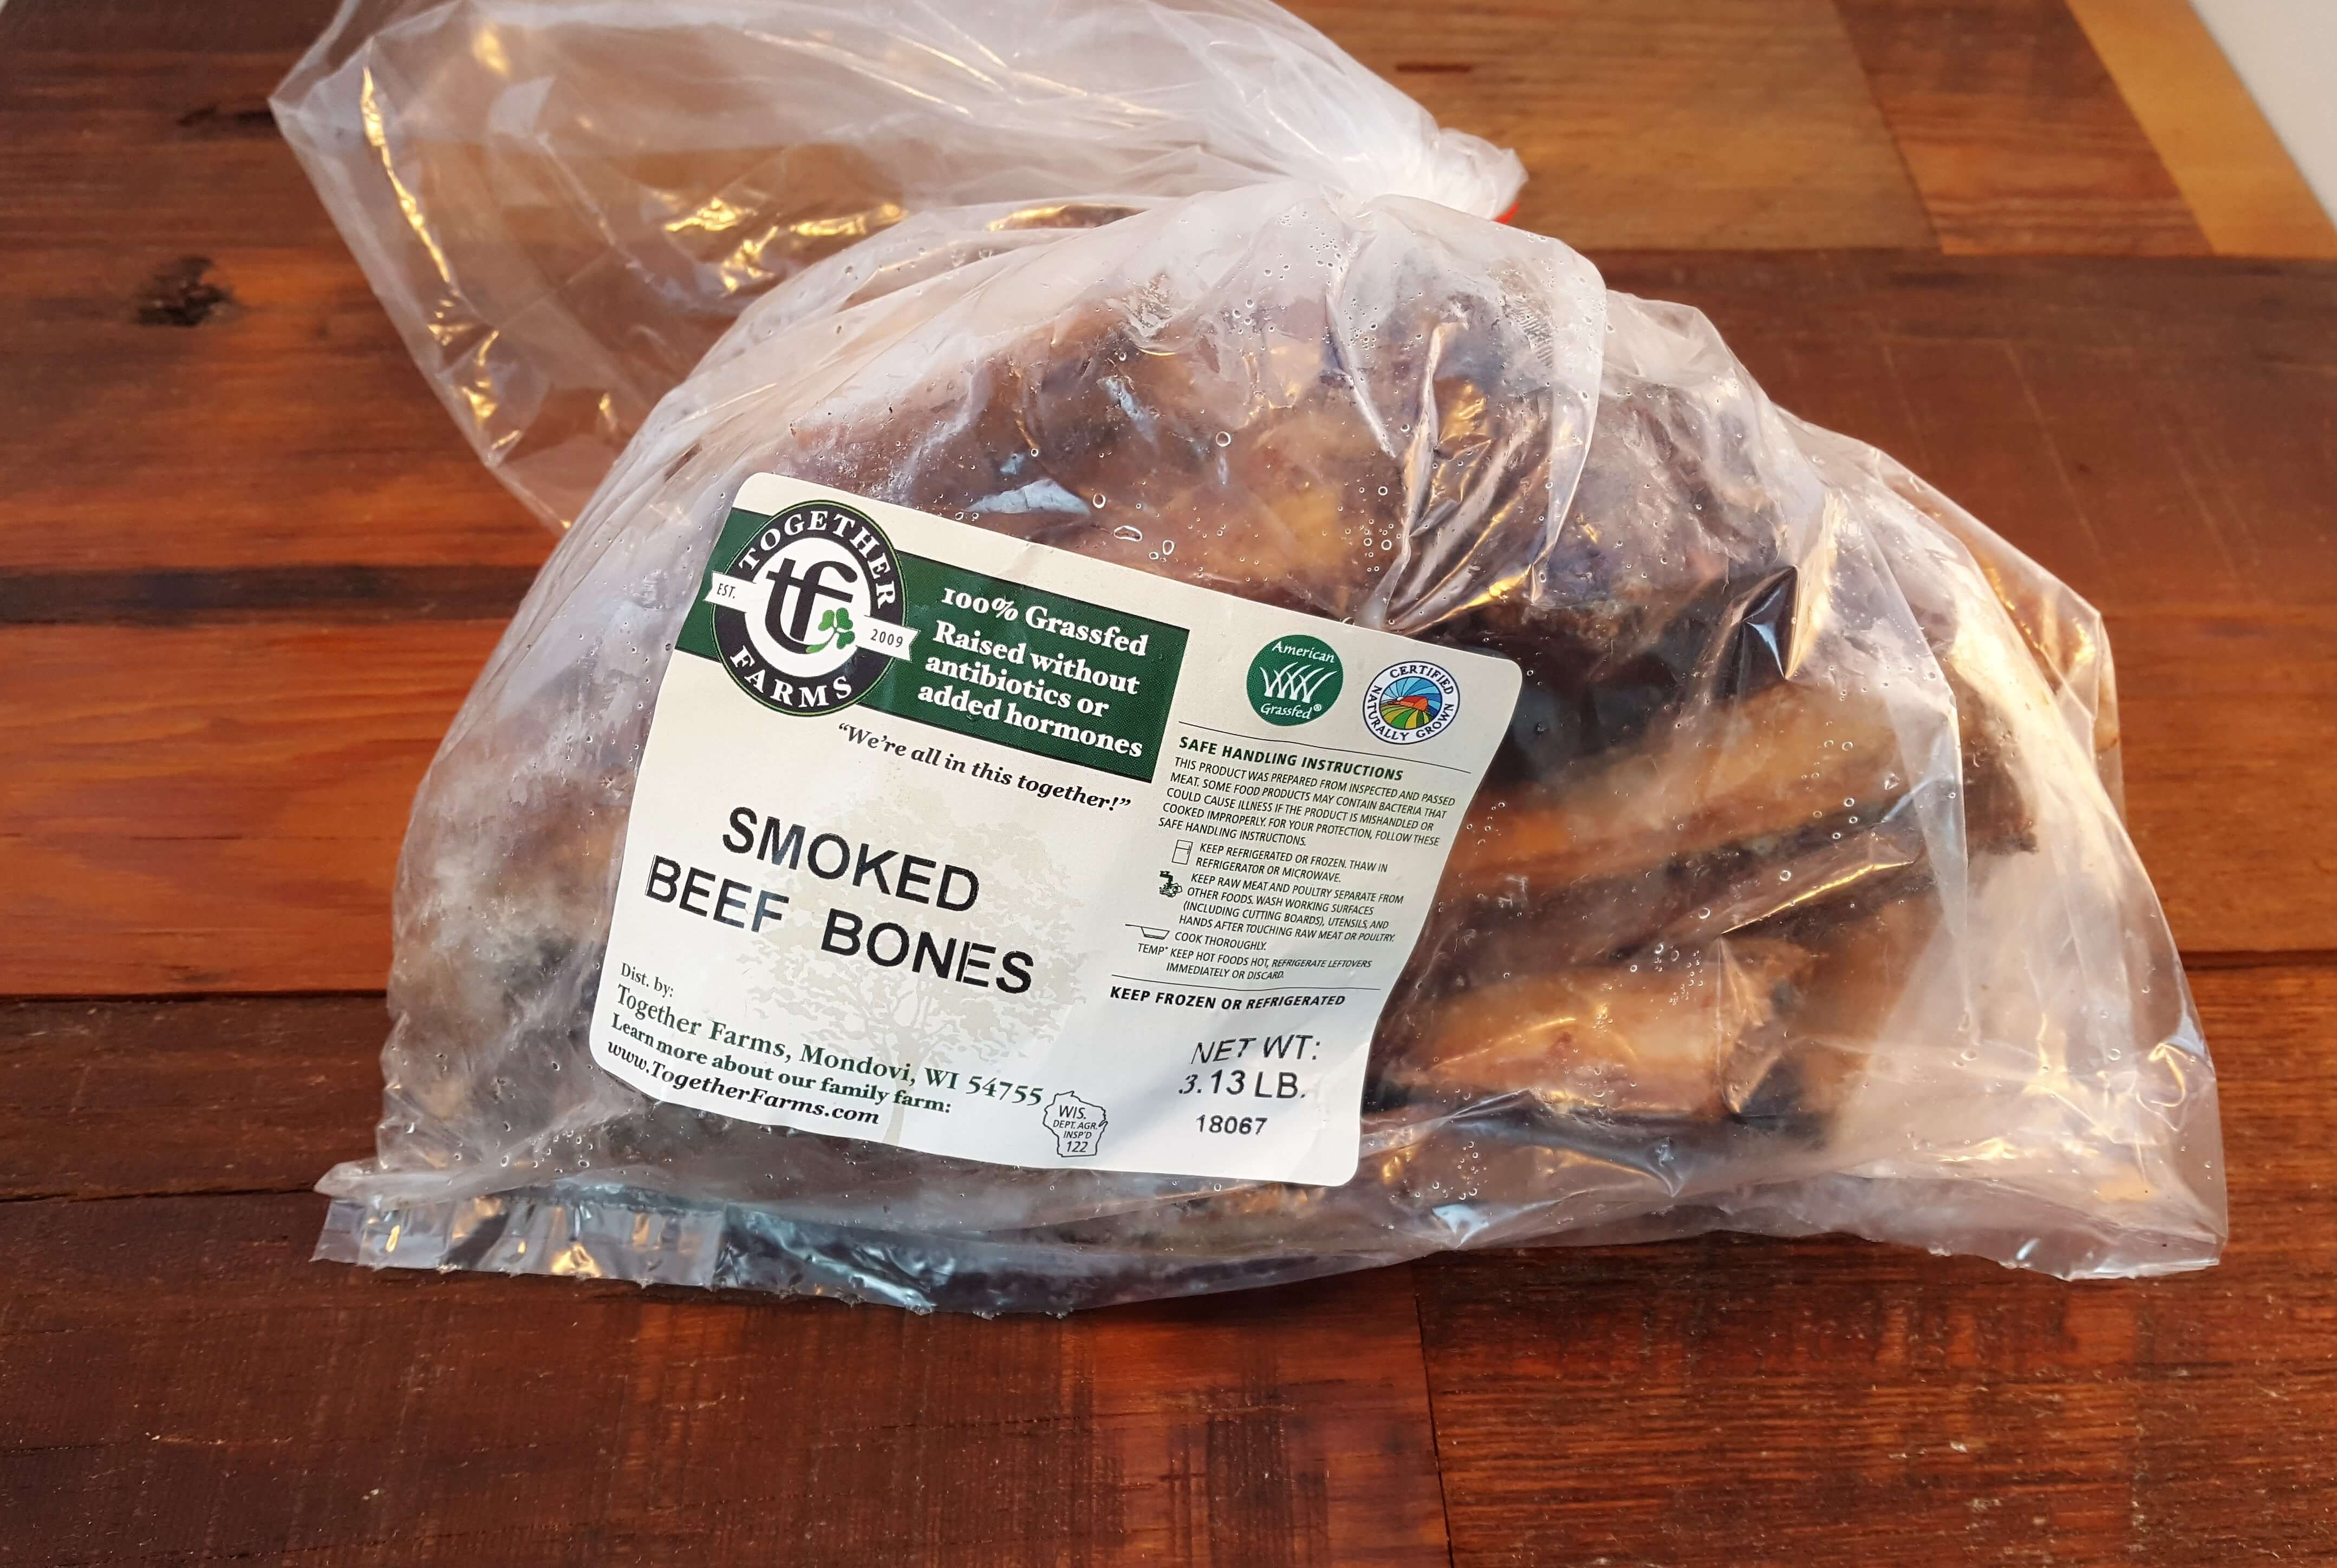 Beef, Smoked Bones